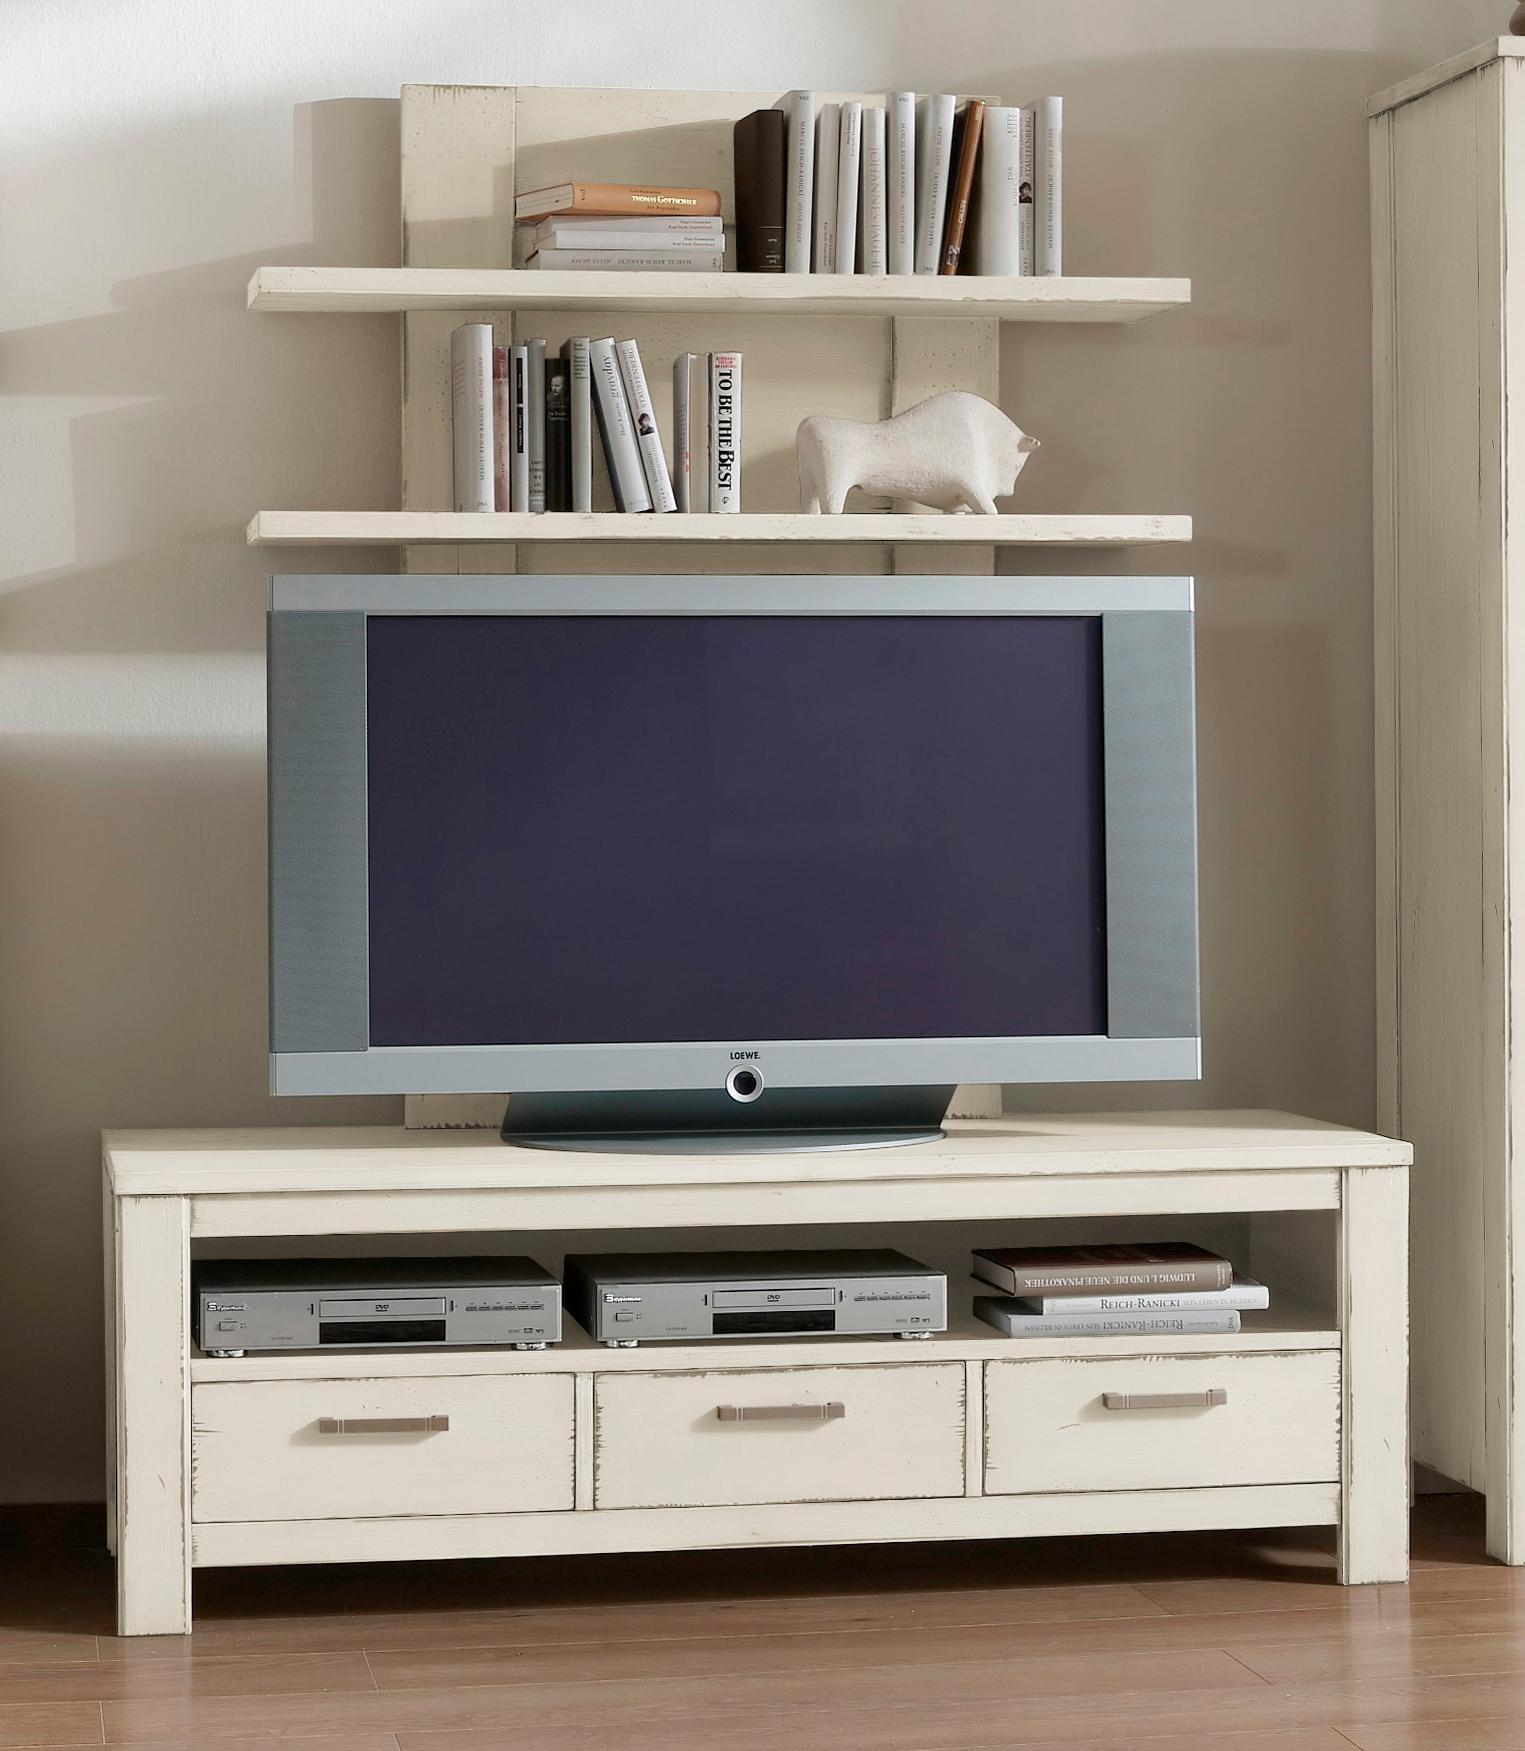 favorit tv paneel lucca breite 120 cm auf raten kaufen. Black Bedroom Furniture Sets. Home Design Ideas